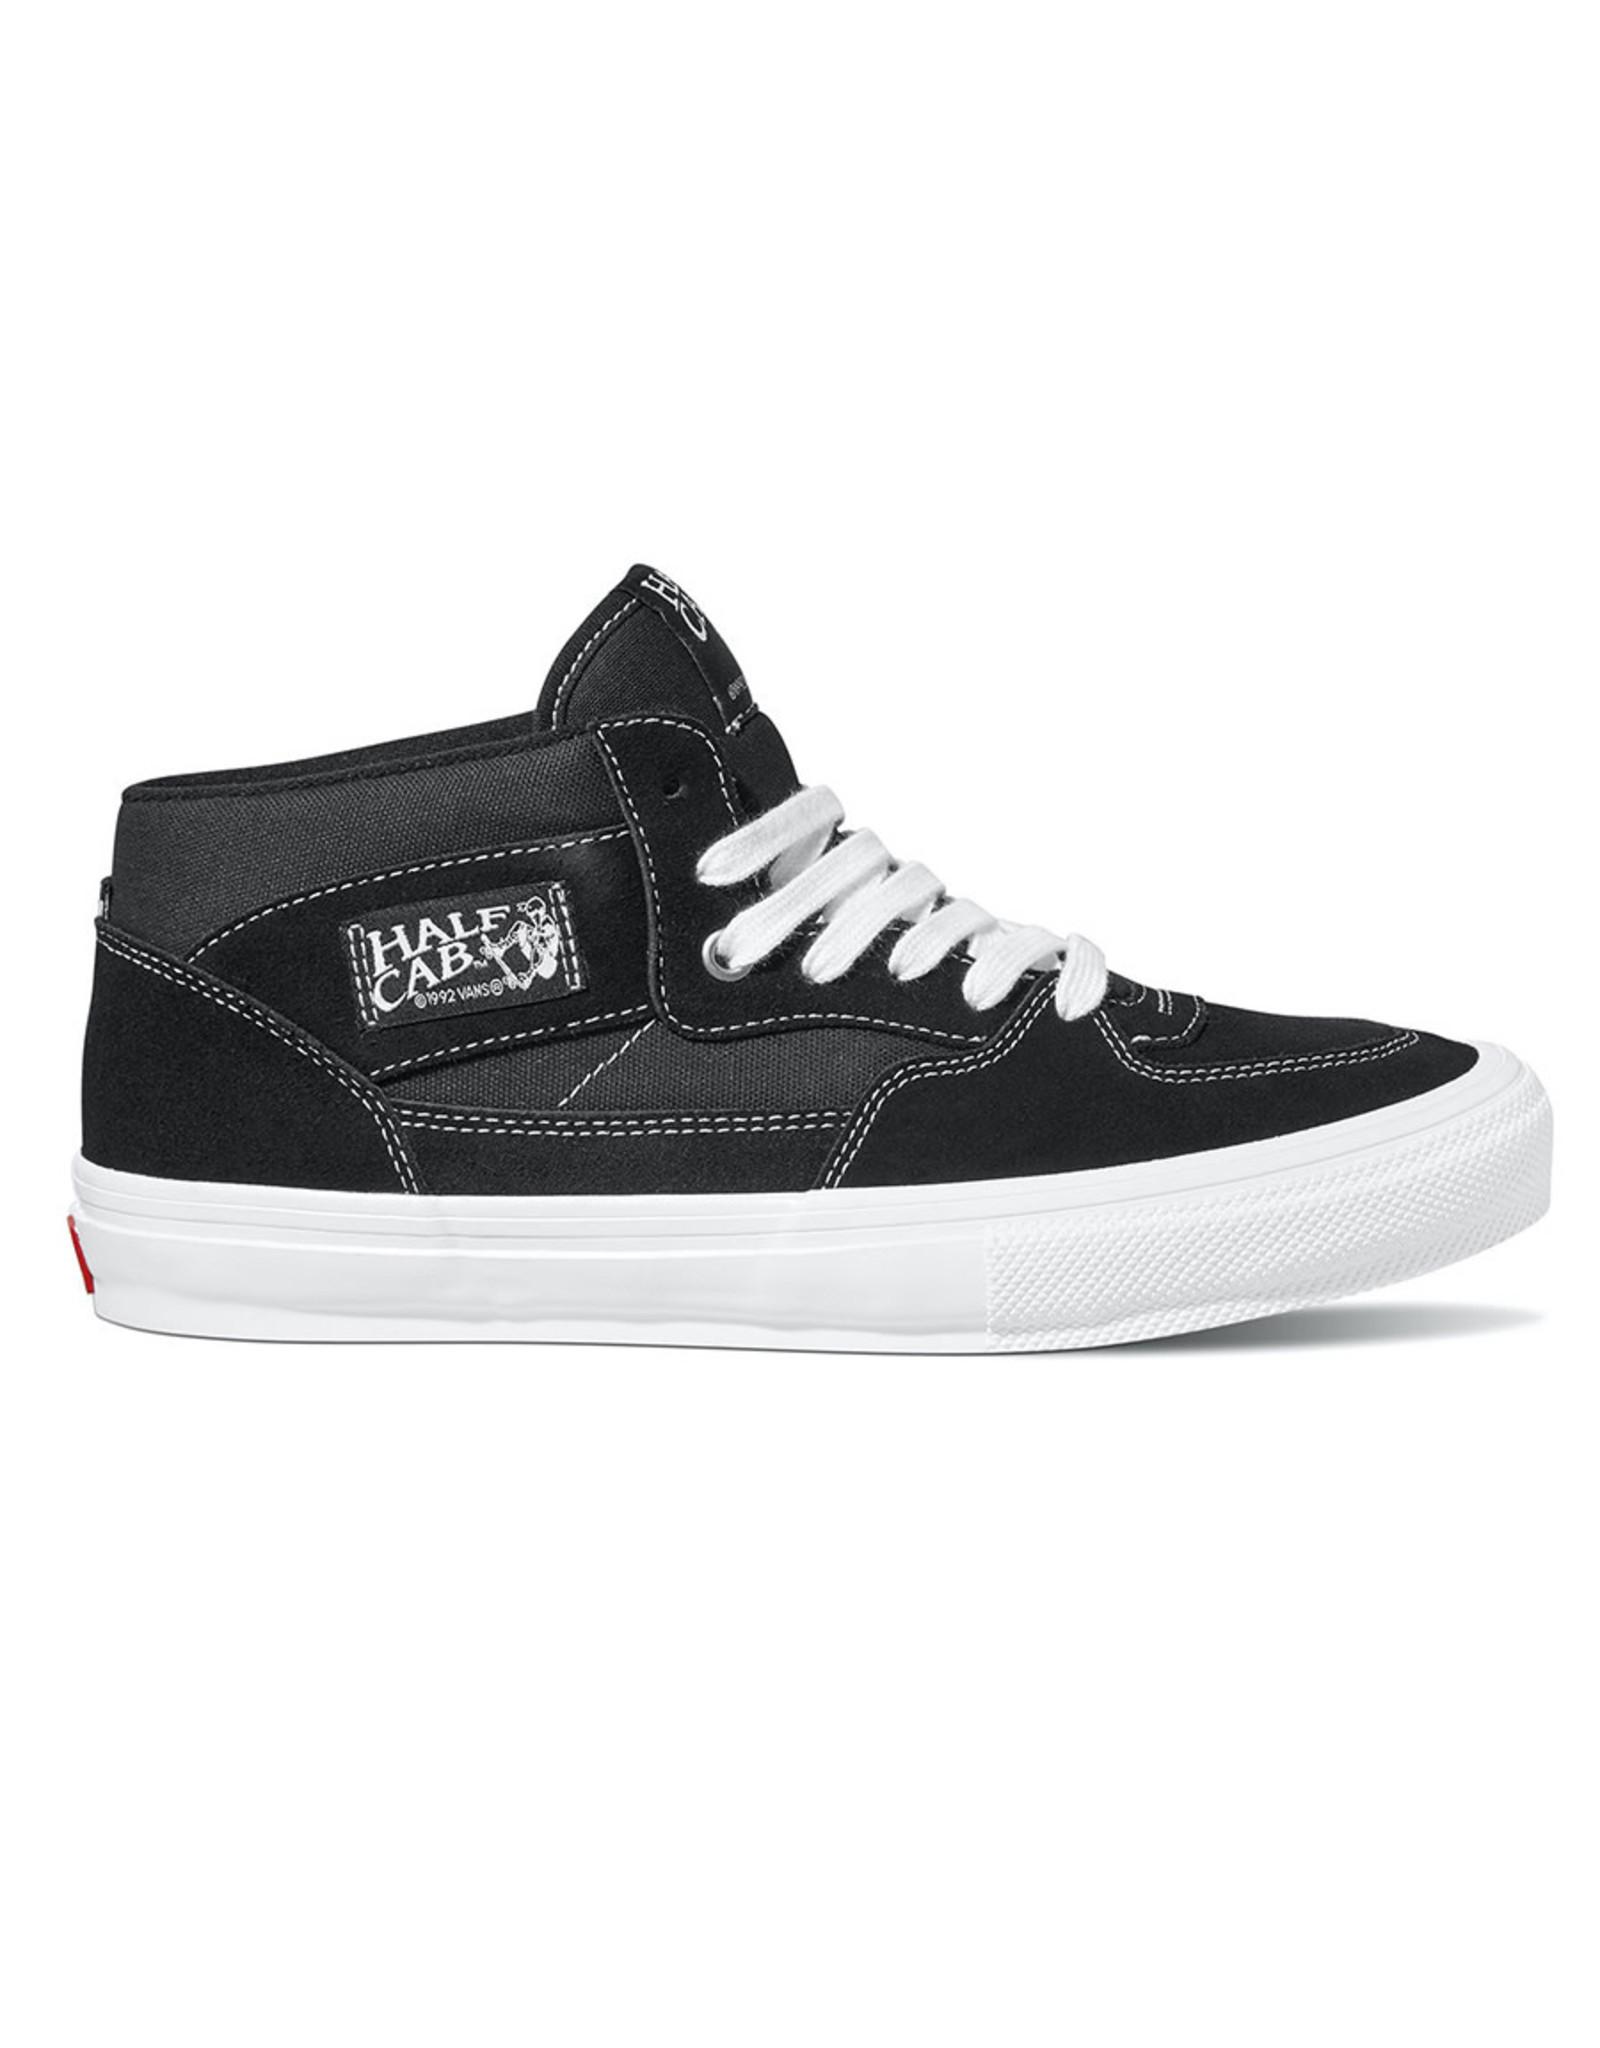 Vans Vans Shoe Skate Half Cab (Black/White)